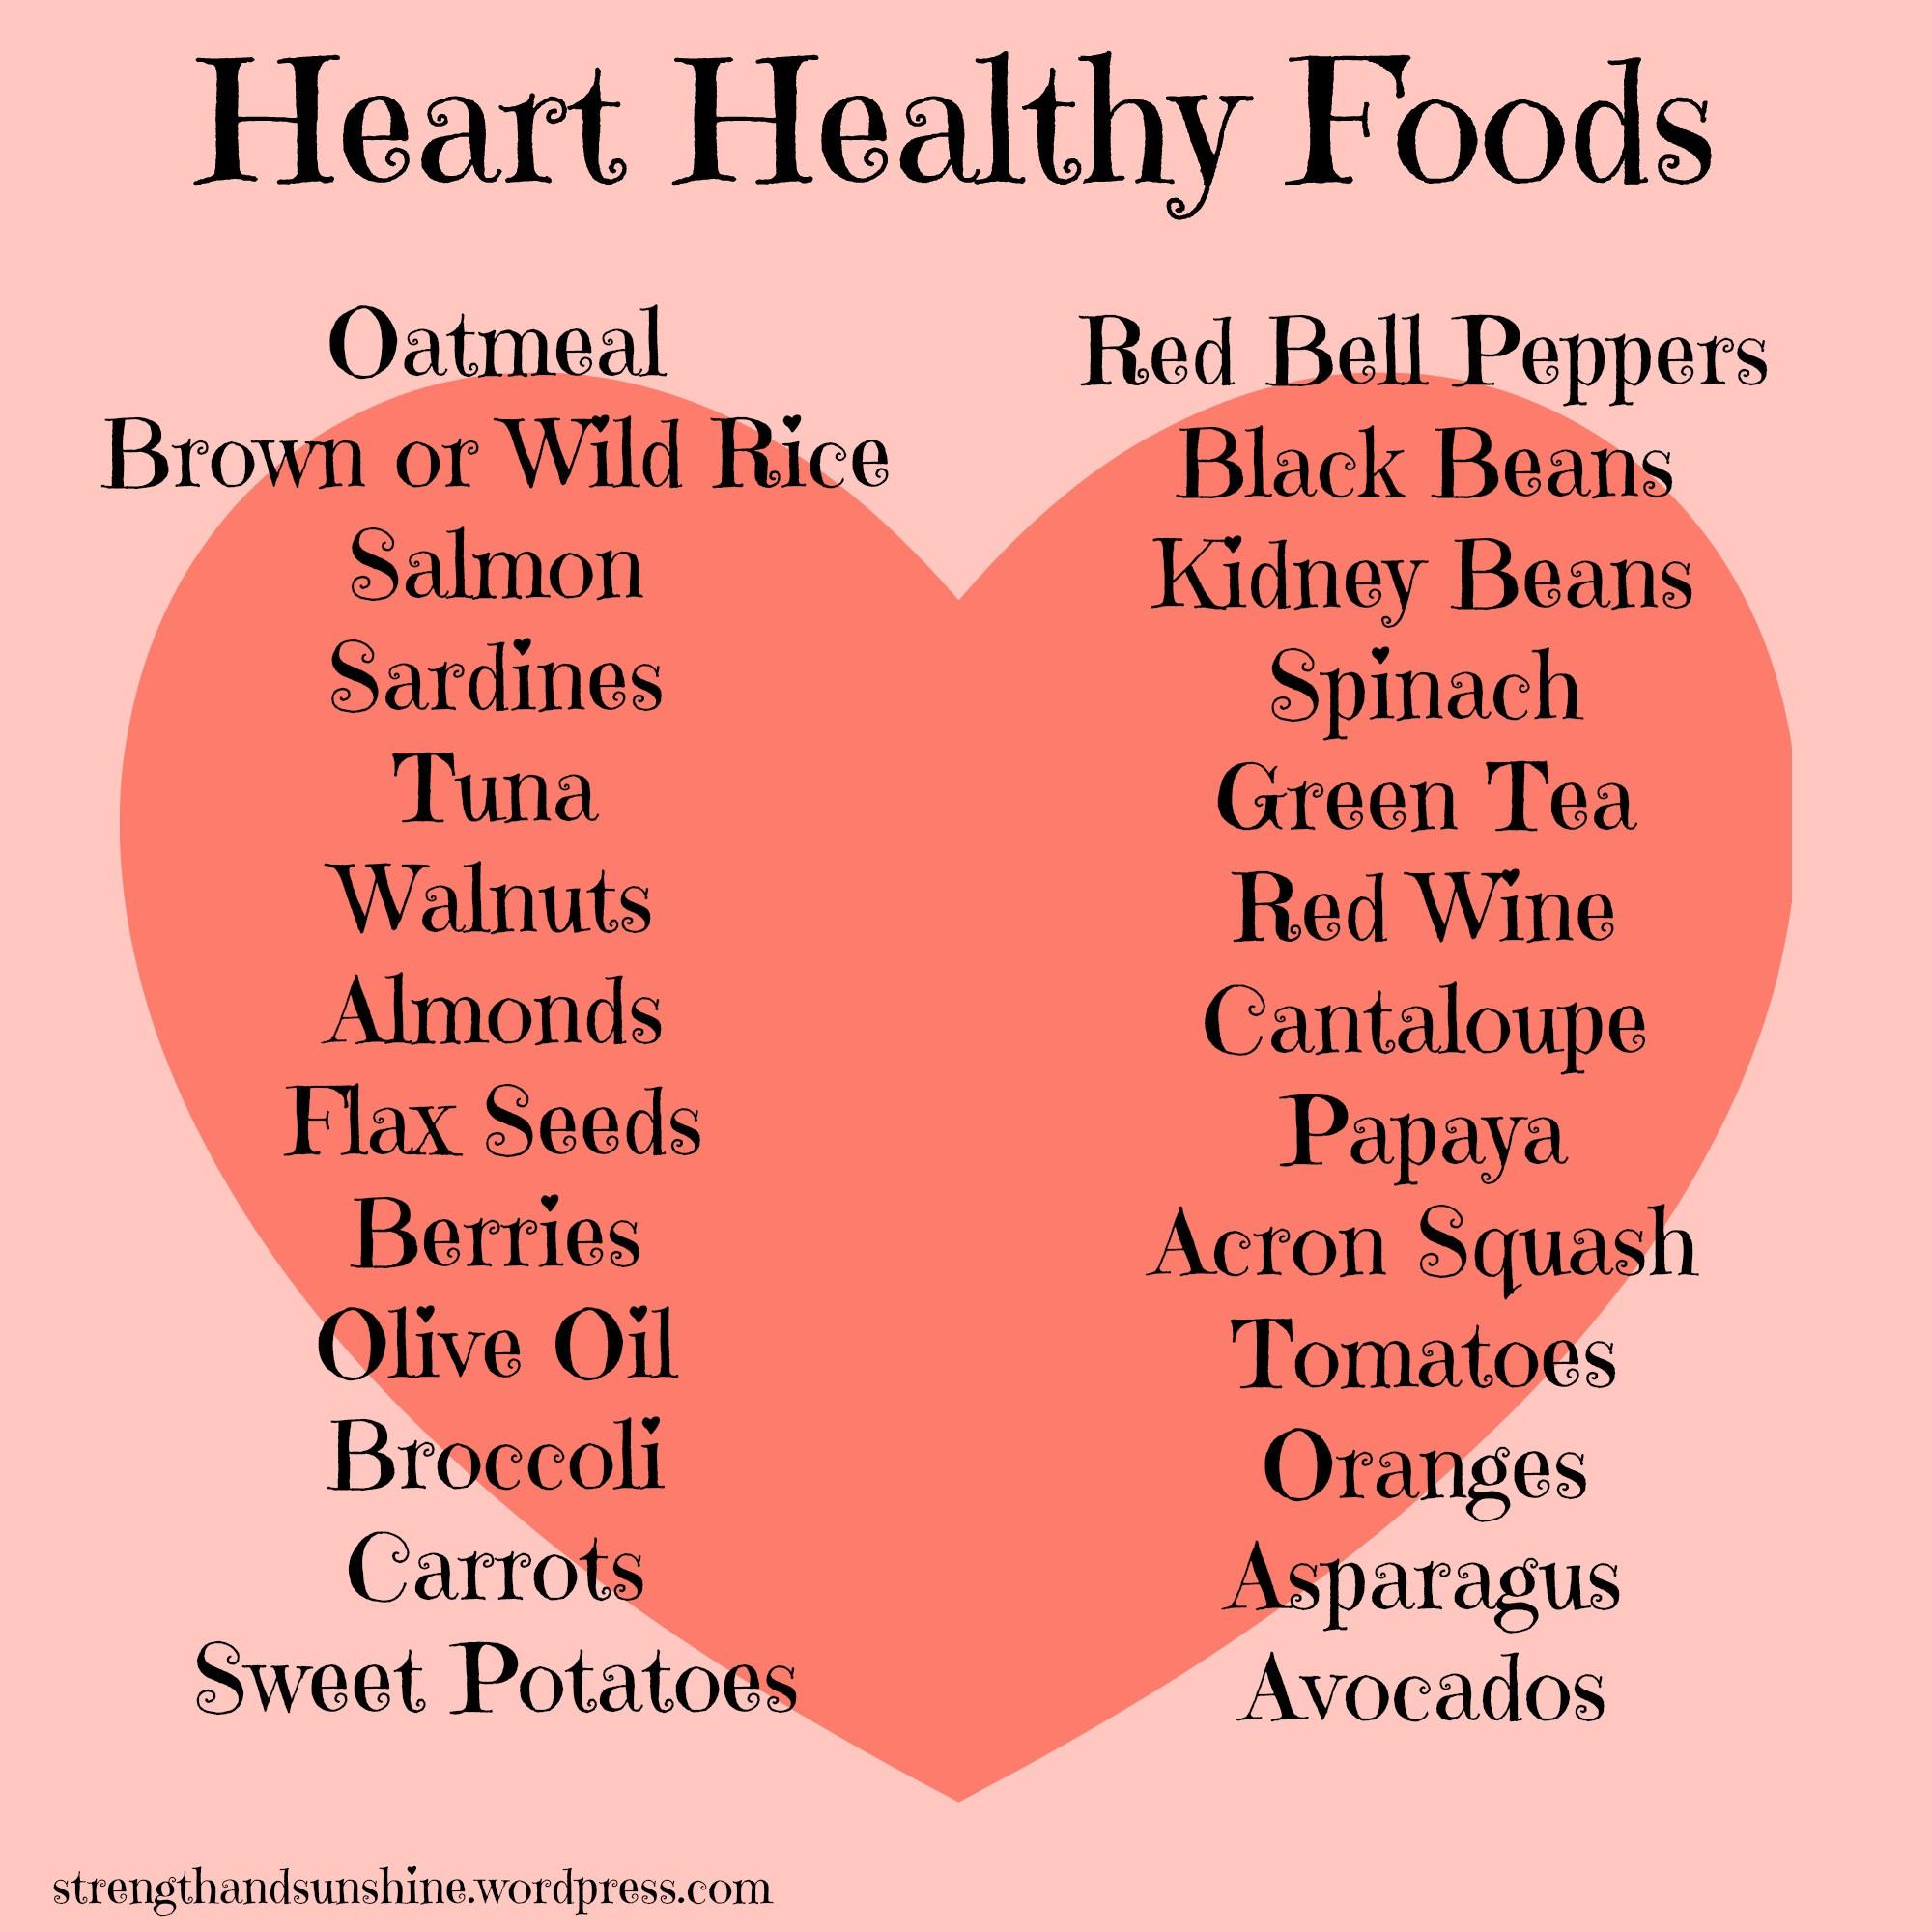 Heart Healthy Snacks On The Go  Blueberry Heartcakes